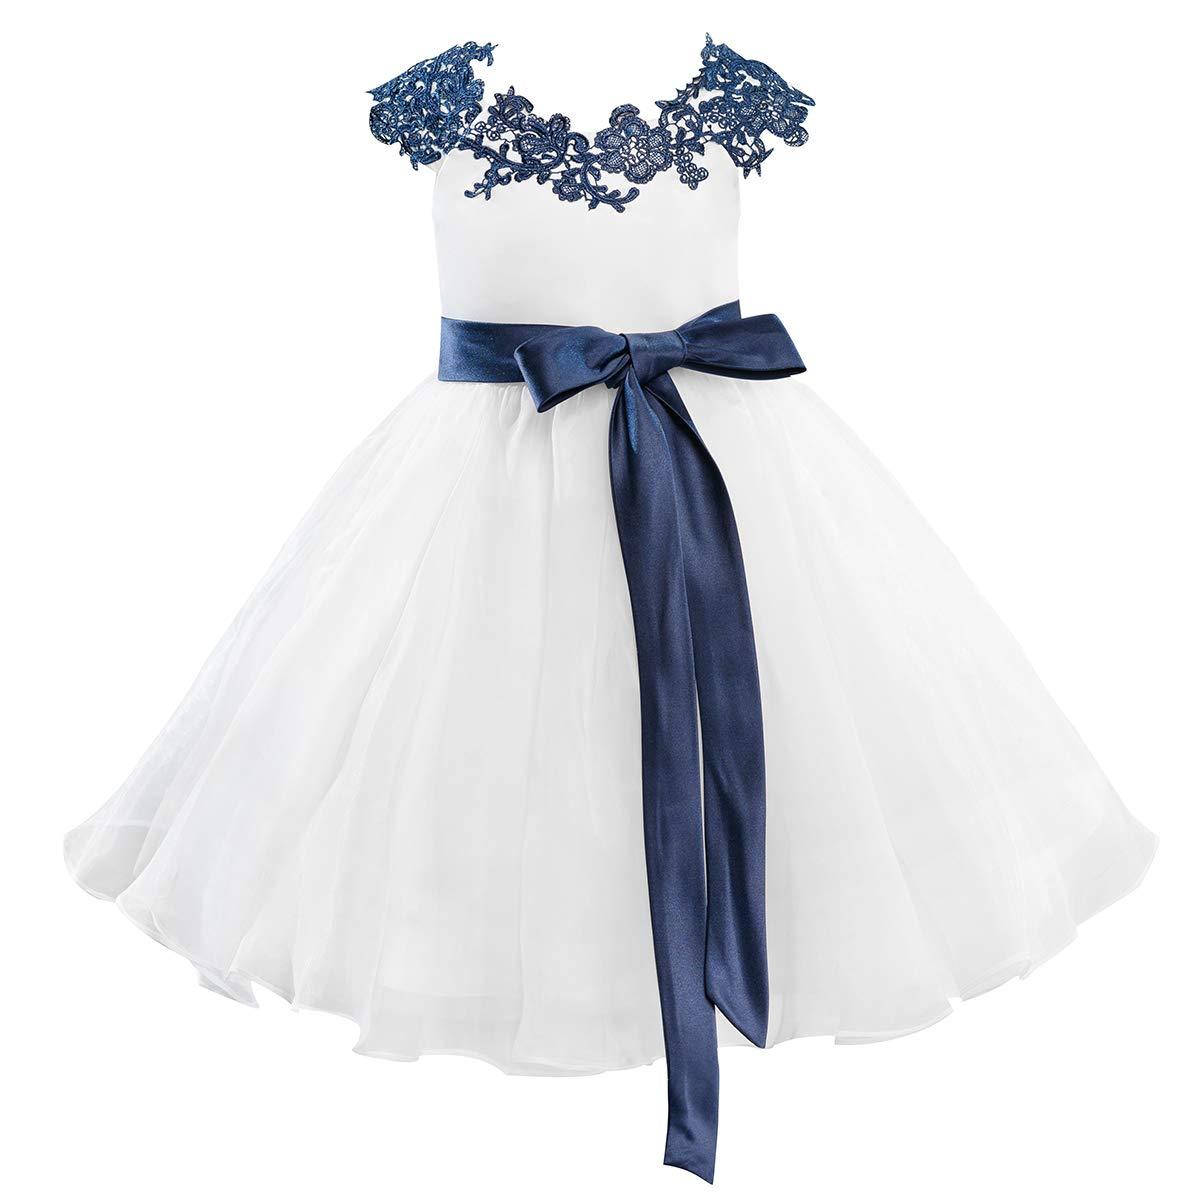 d2bddb5e52 Amazon.com  Dresslane Navy Blue Lace Ivory Organza Flower Girl Dress Kids  Dress  Clothing